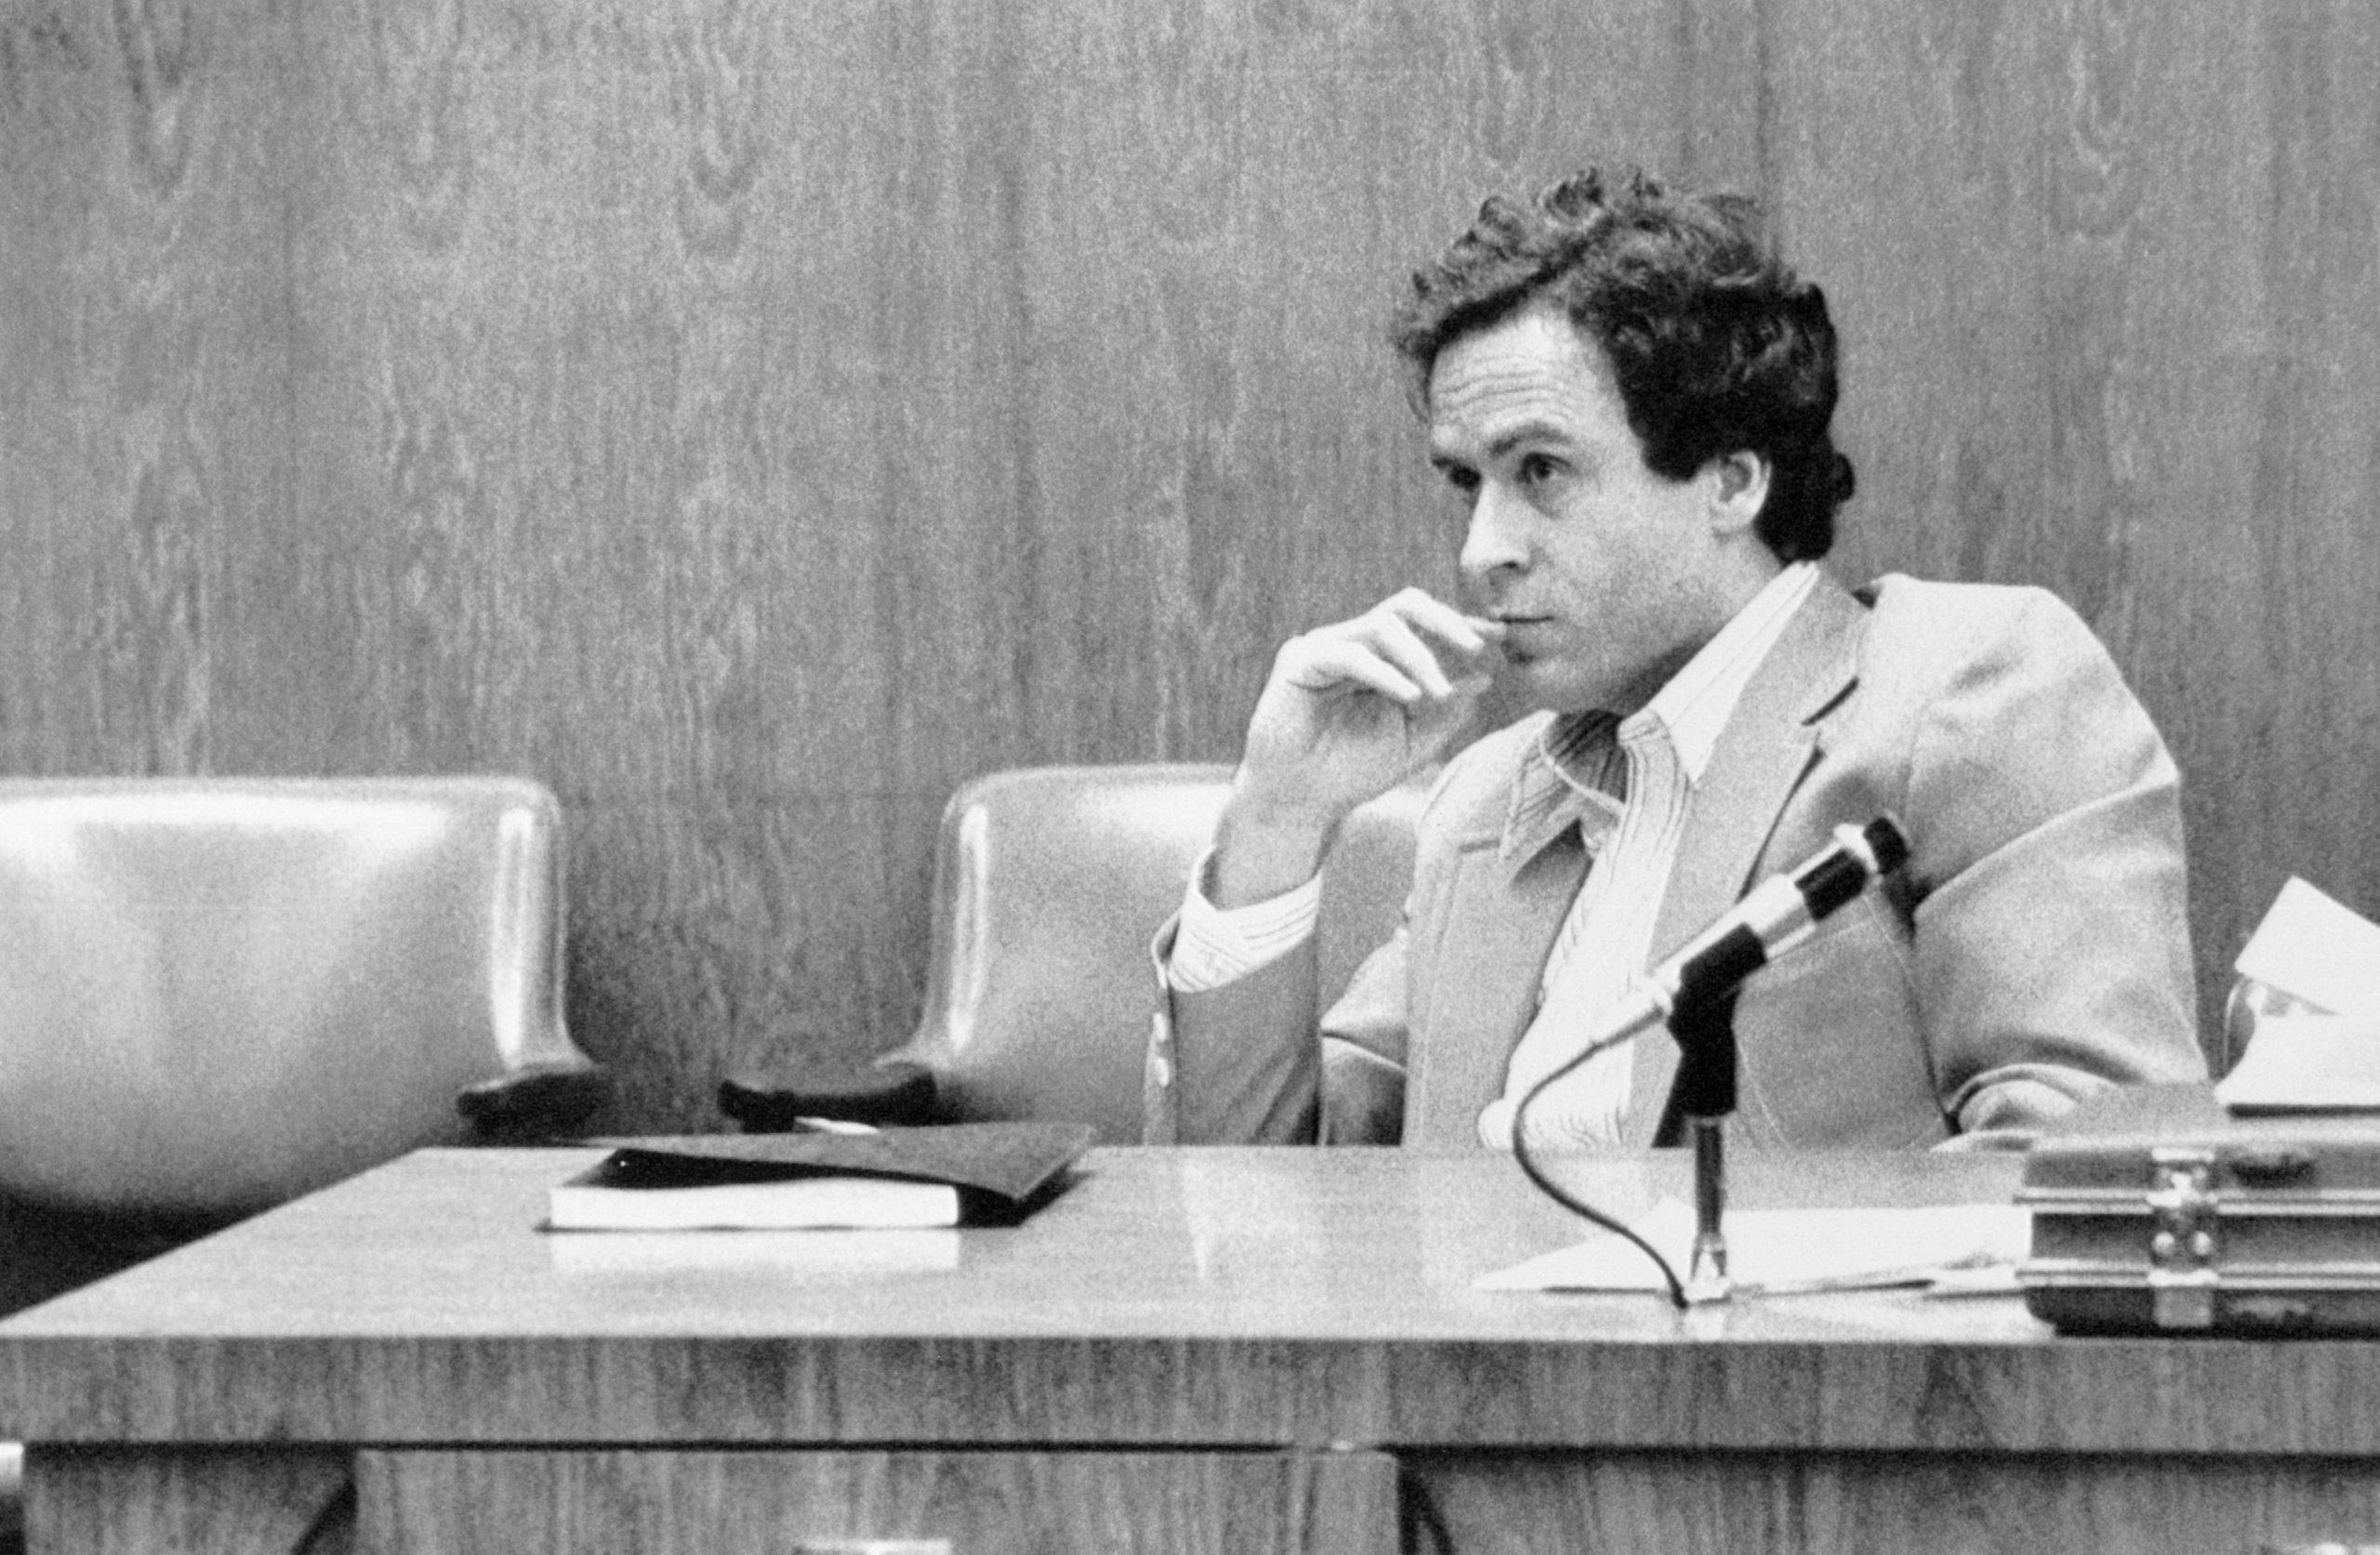 Vrah Ted Bundy